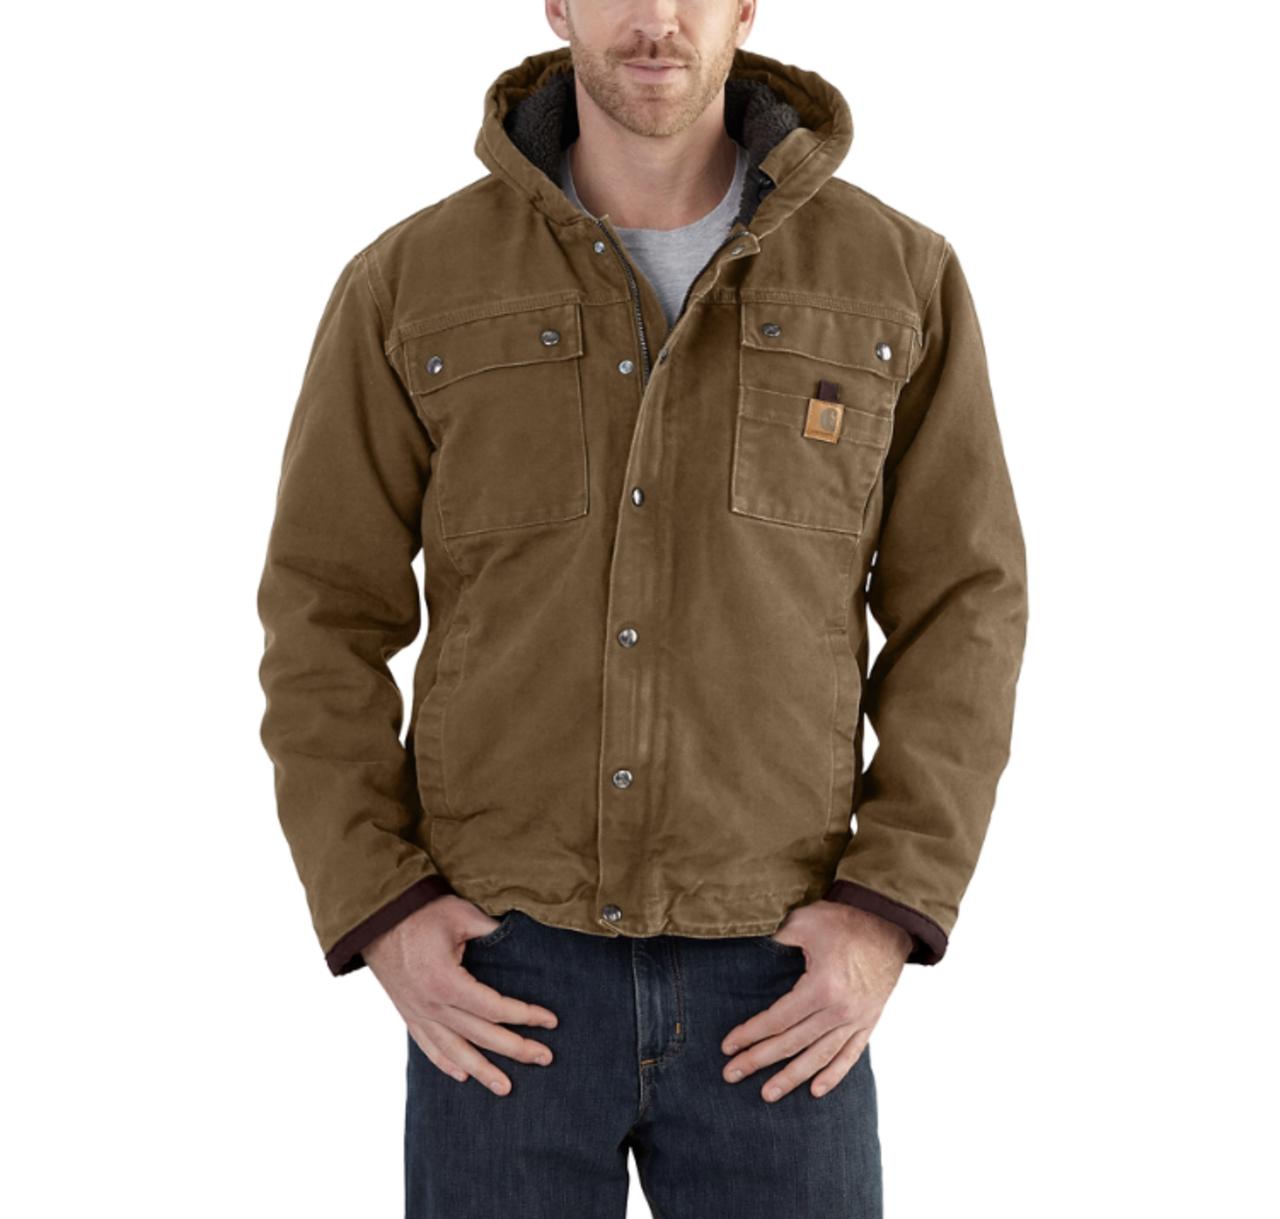 f82db0ec7c Men's Carhartt Bartlett Jacket Sherpa Lined - Herbert's Boots and ...